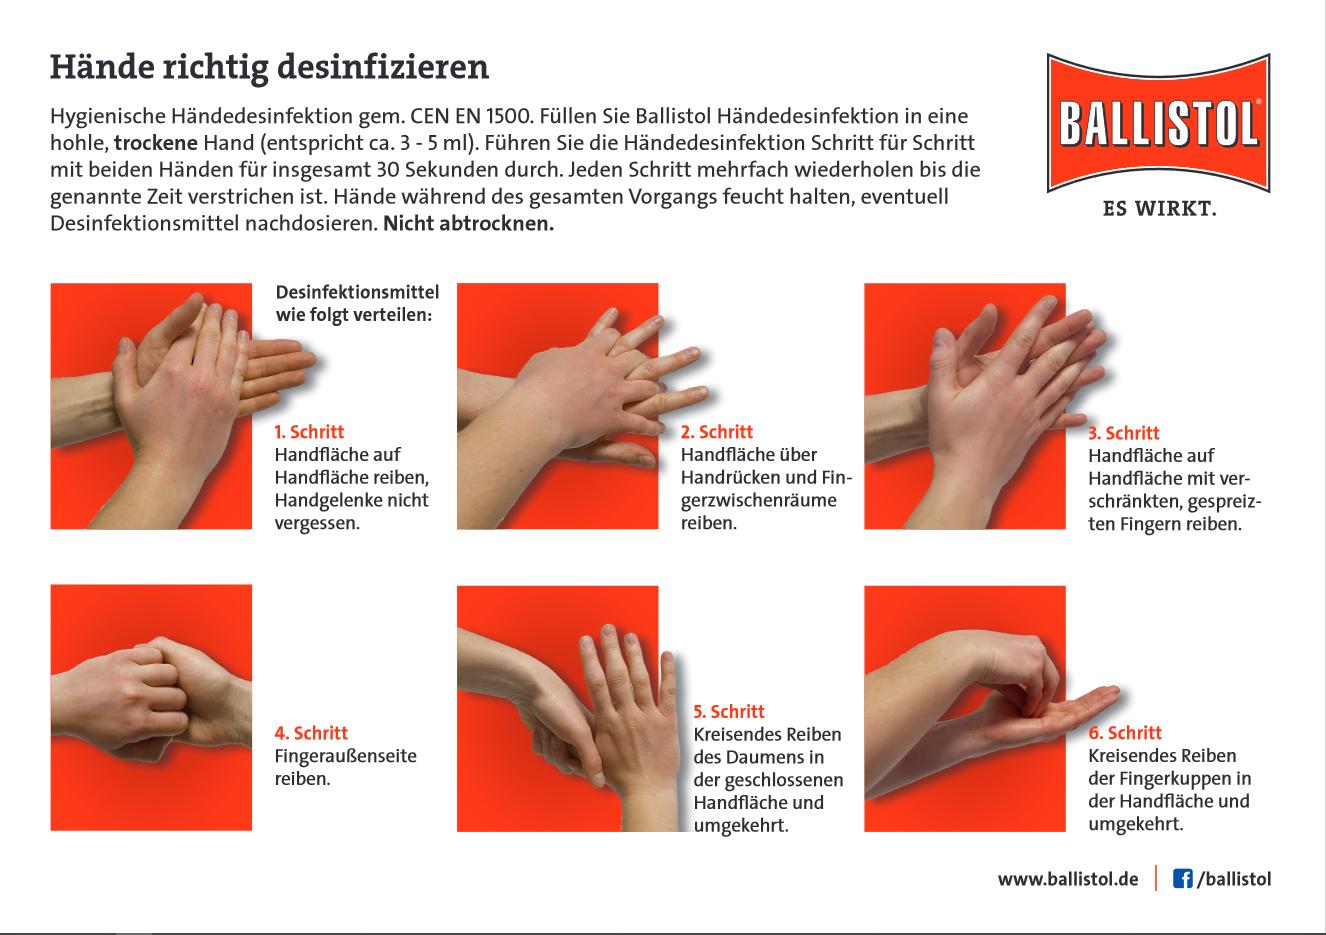 BALLISTOL Händedesinfektion, Antiseptikum